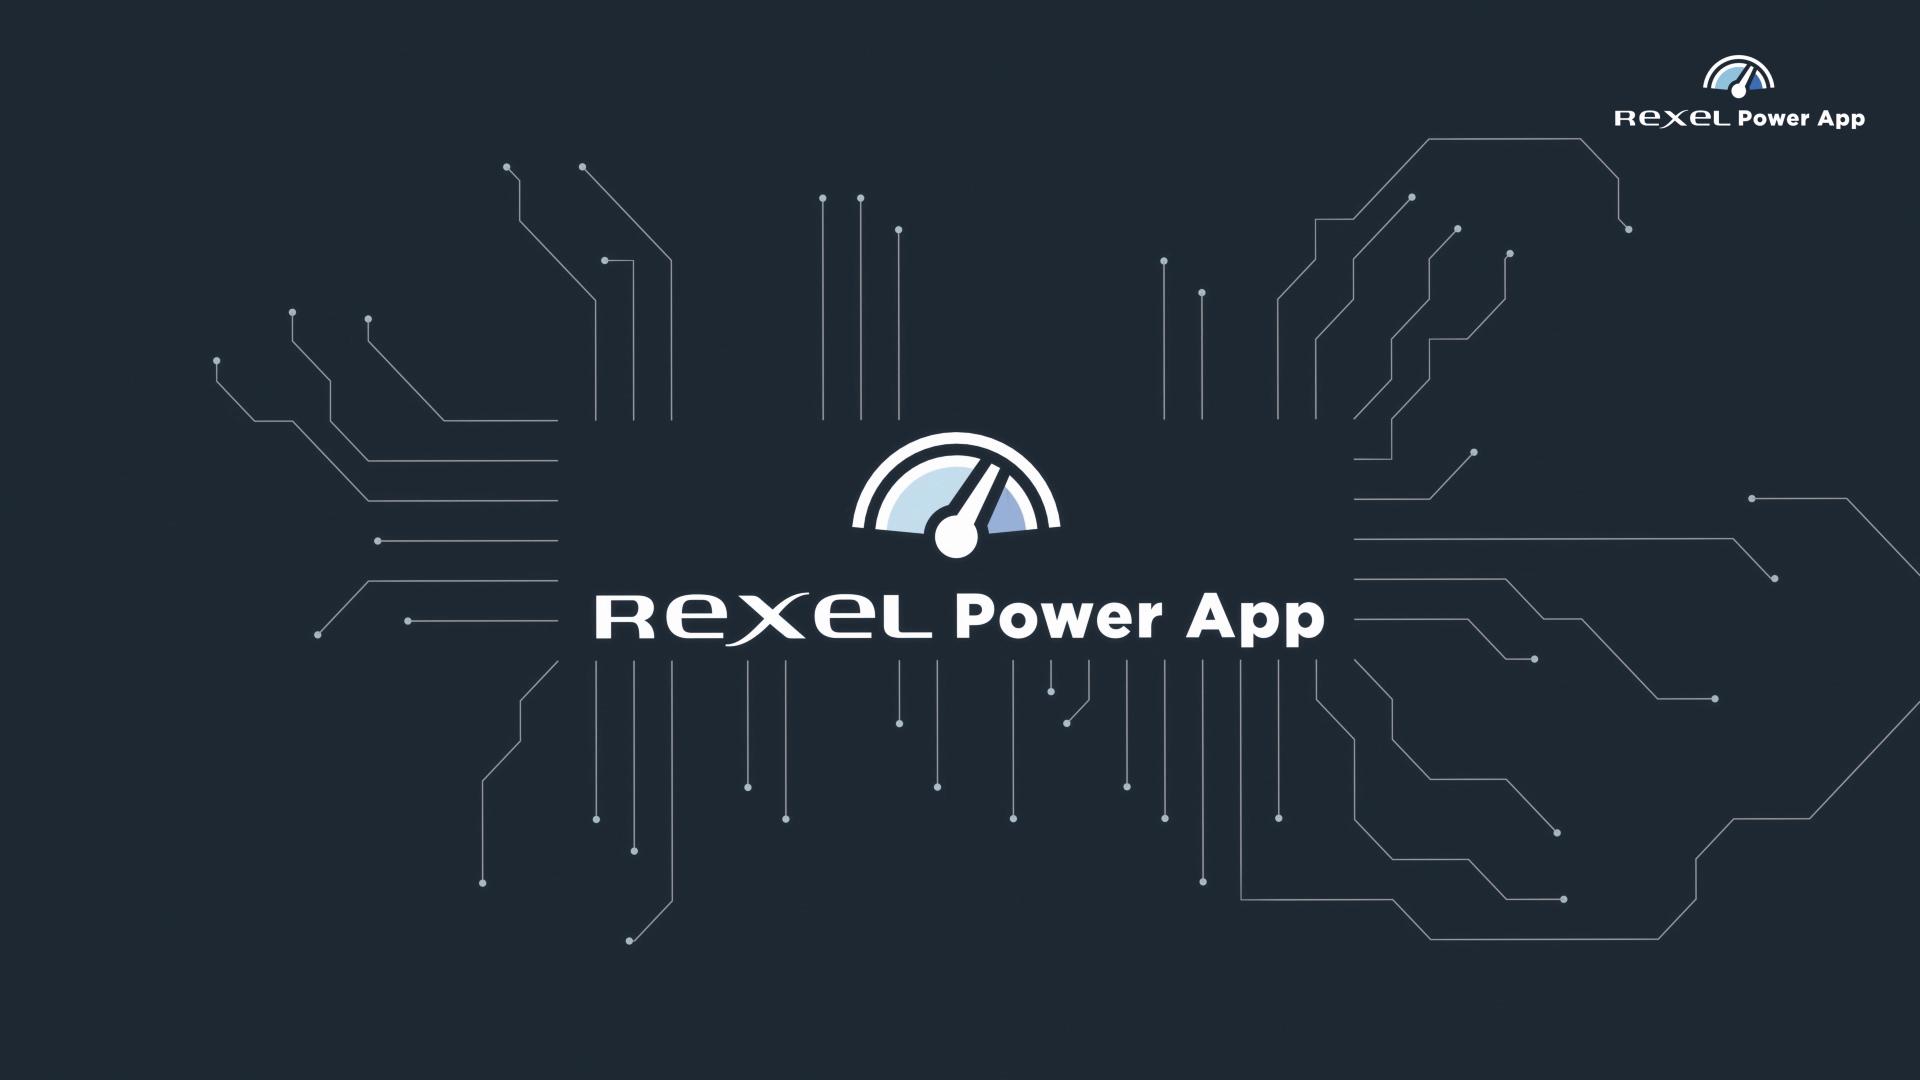 rexel_power_app_00003